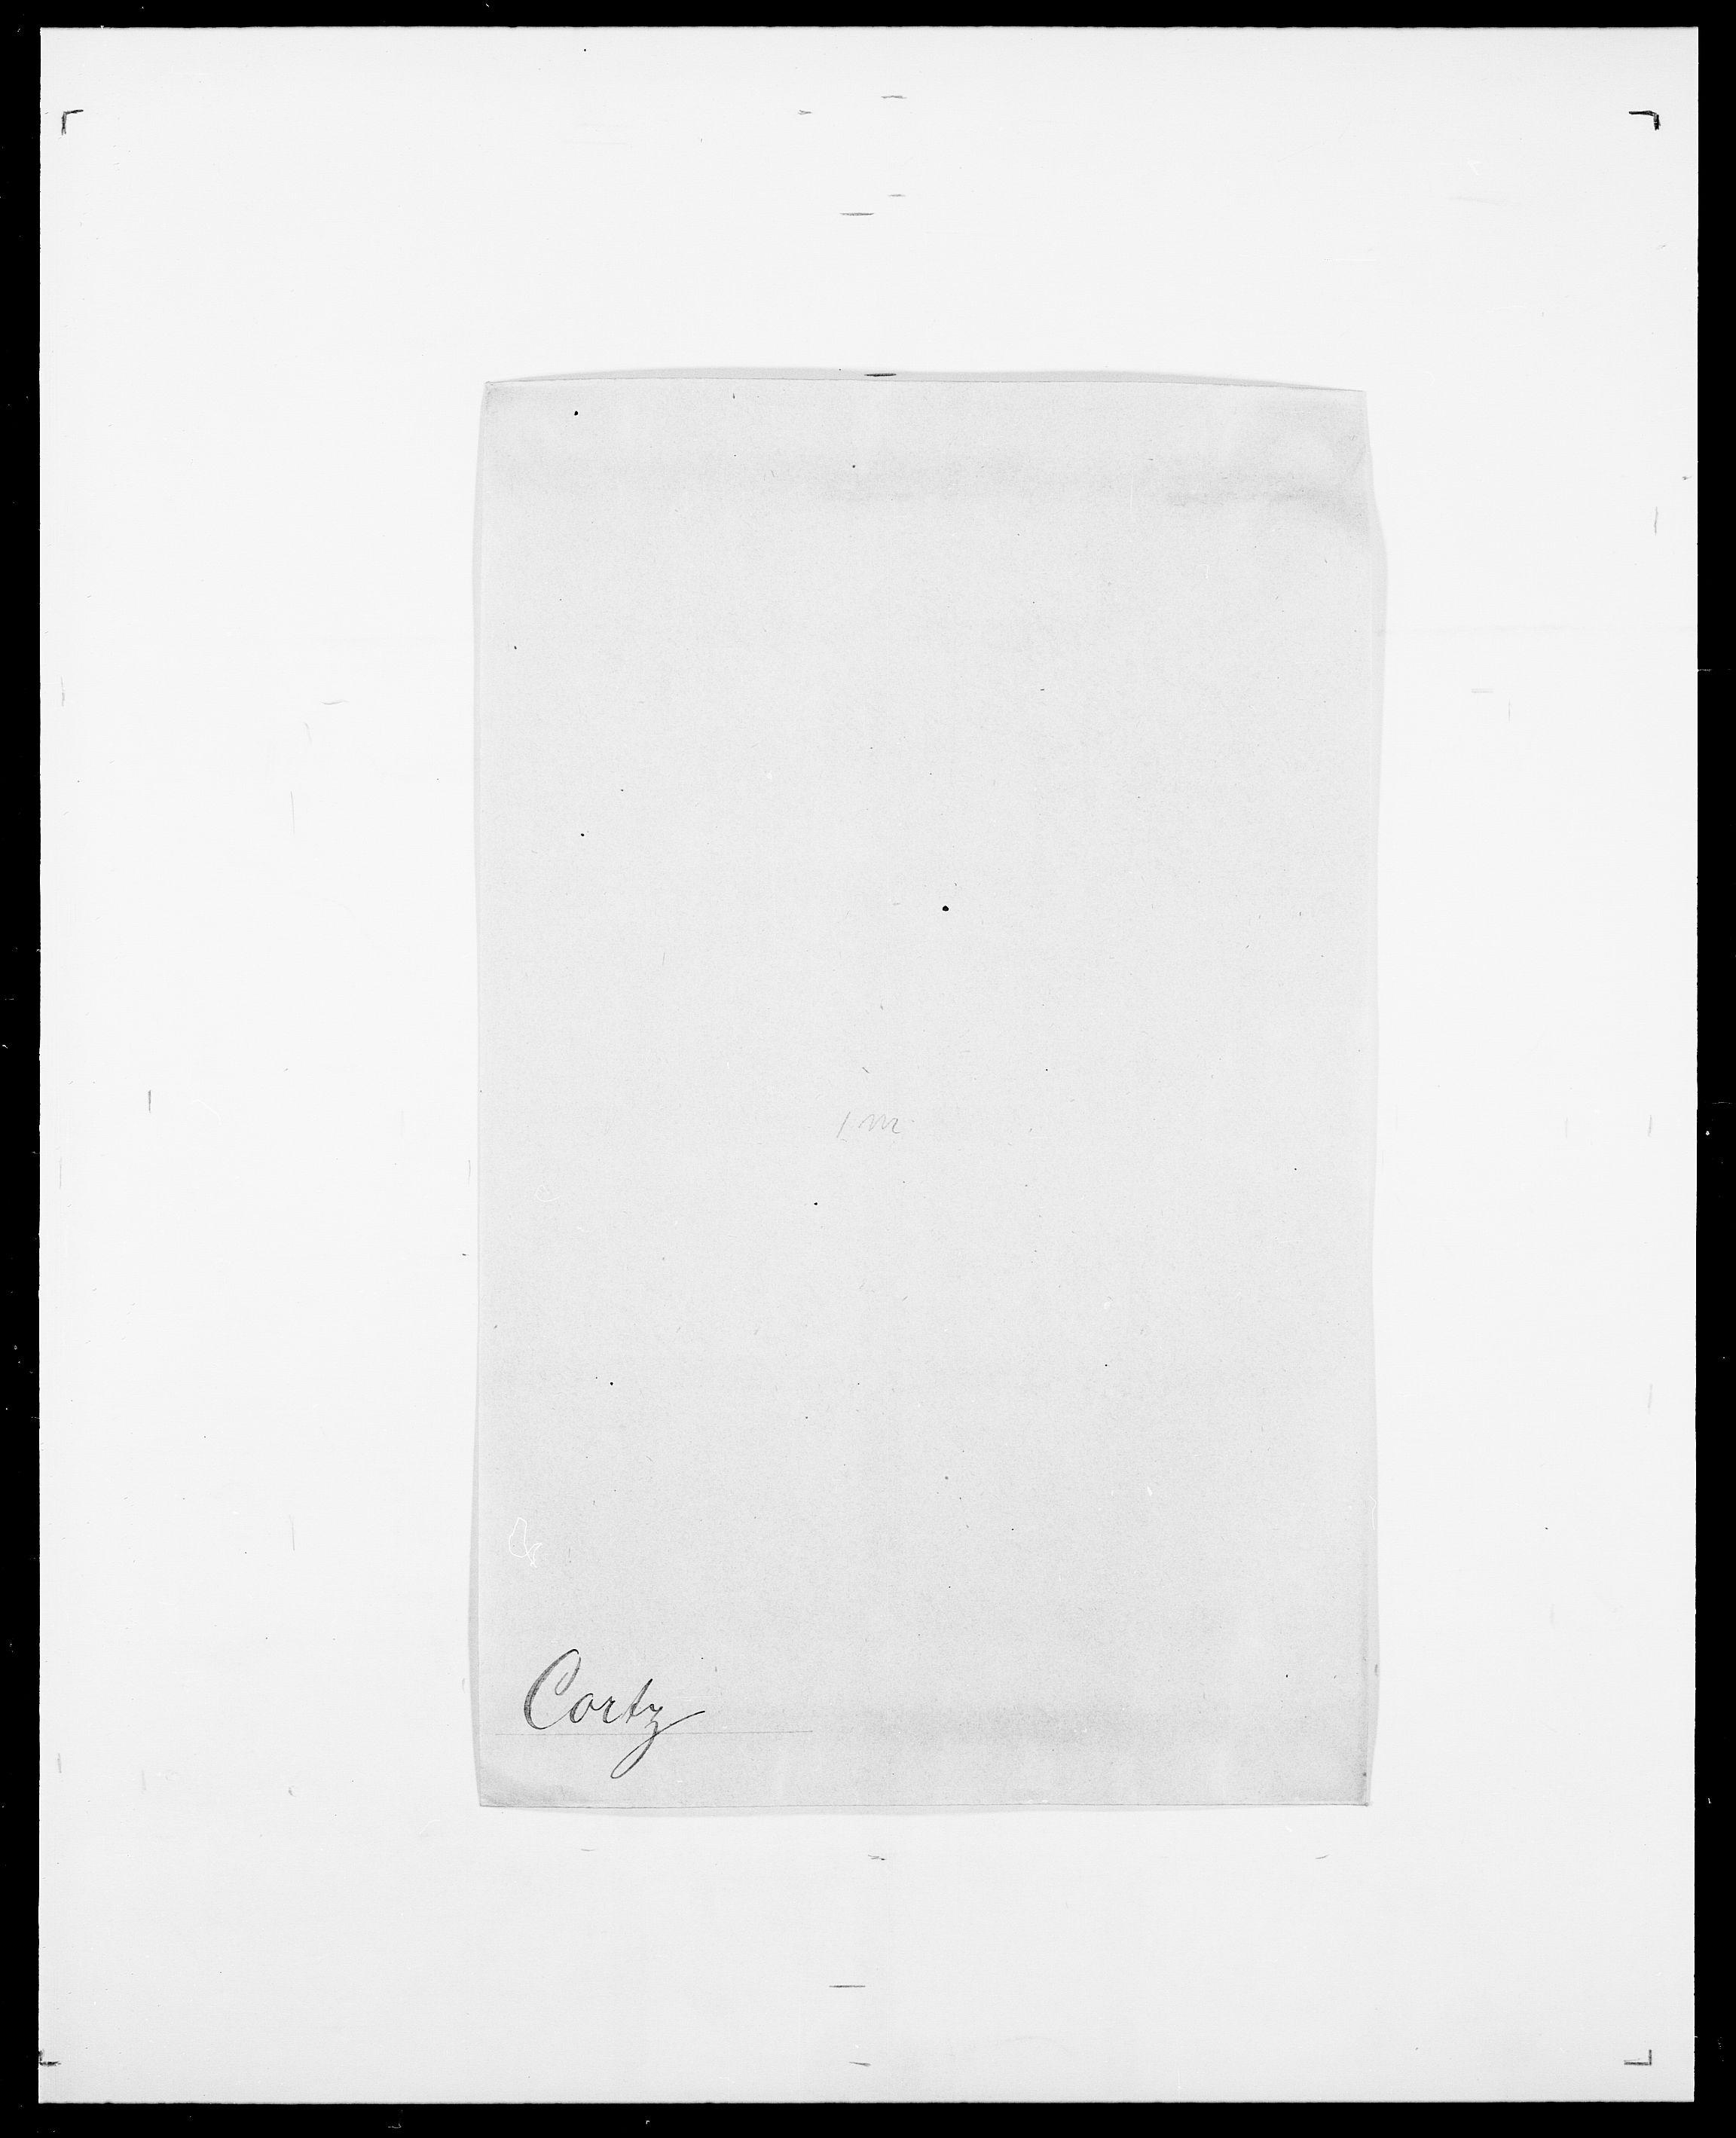 SAO, Delgobe, Charles Antoine - samling, D/Da/L0008: Capjon - Dagenbolt, s. 547